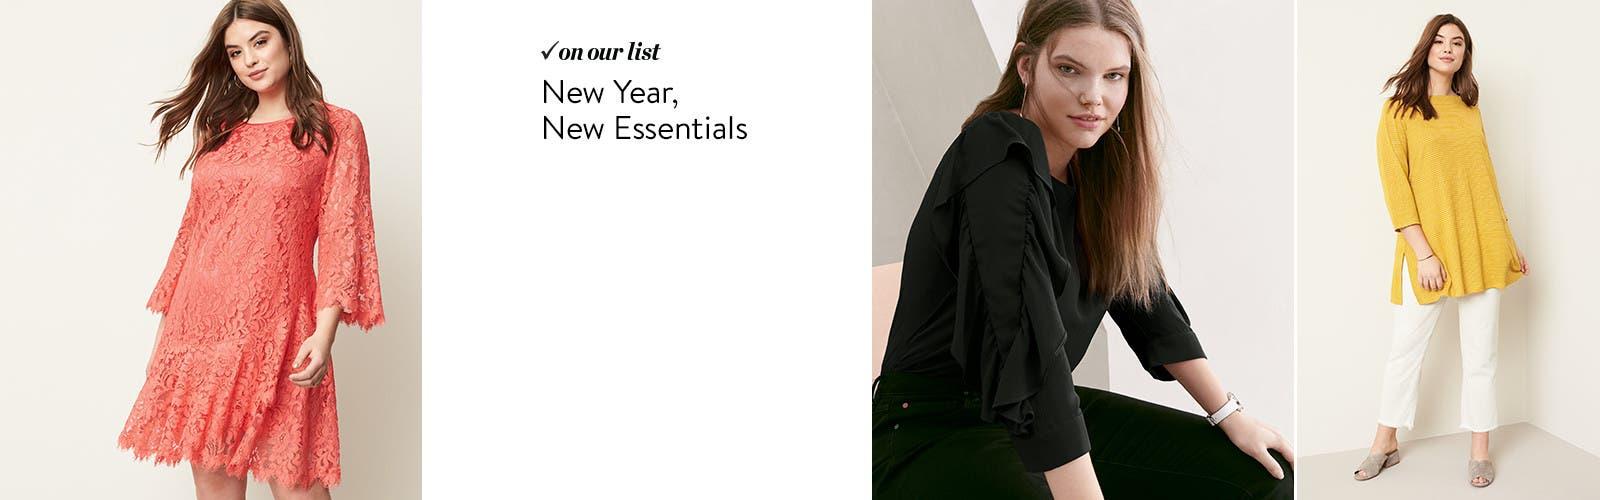 New year, new essentials.